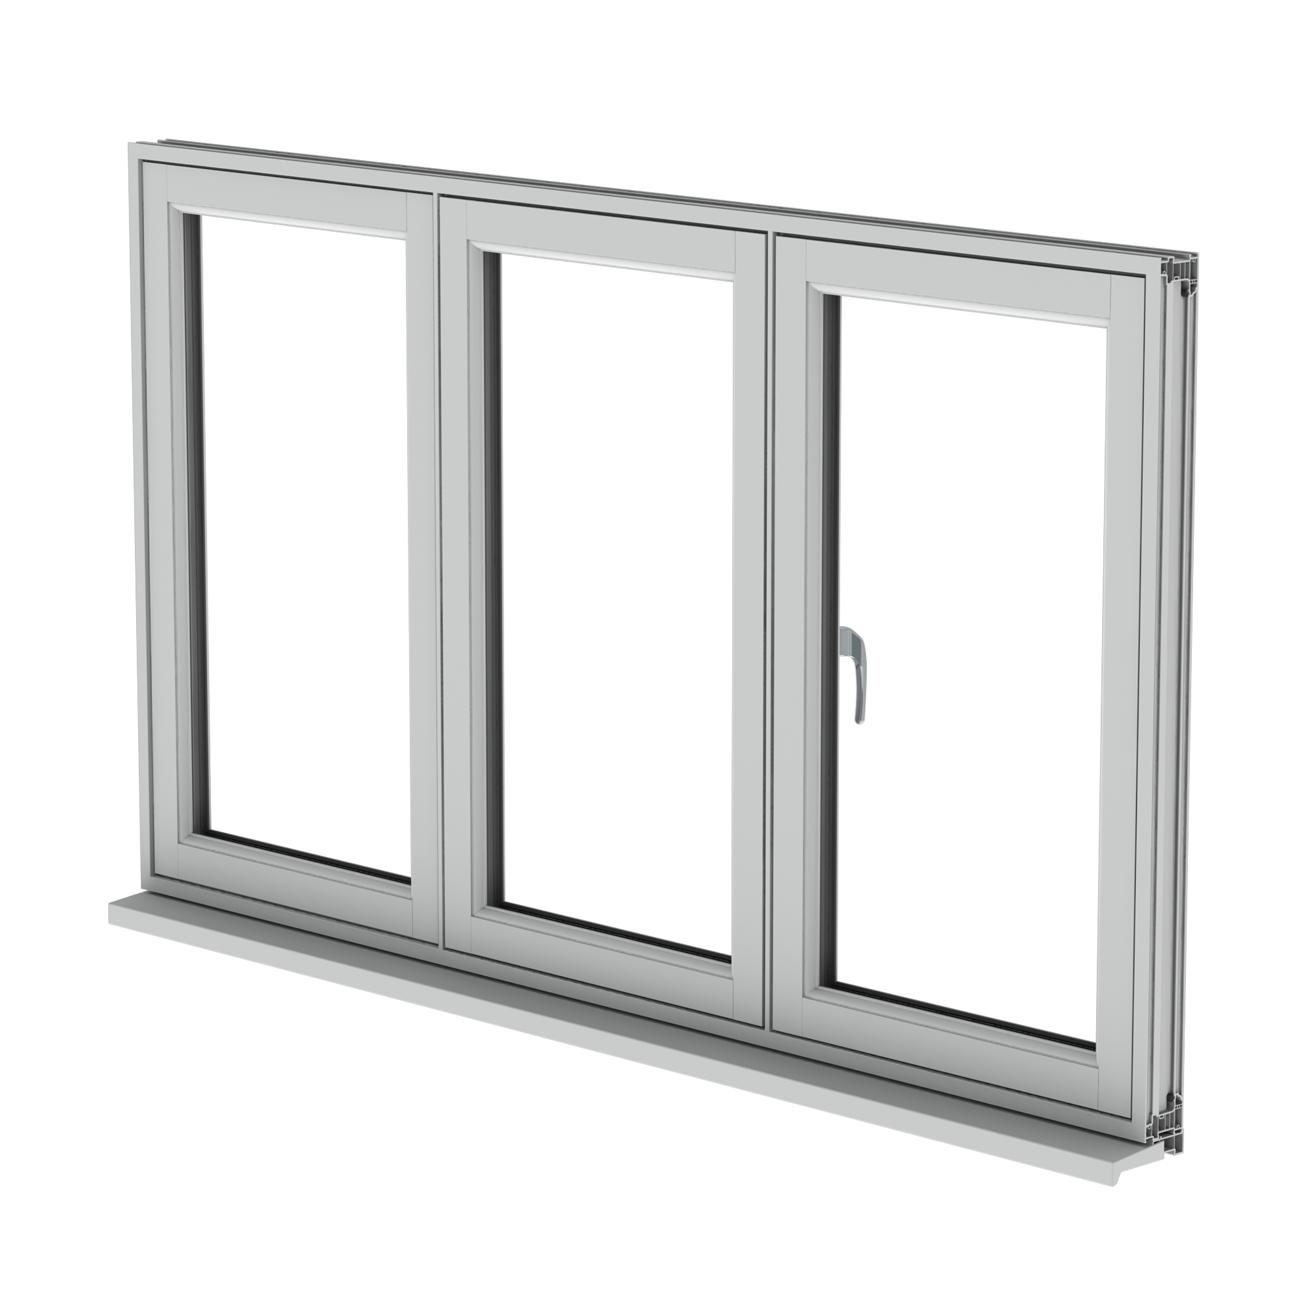 Resurgence Flush Sash Window Profiles Liniar Upvc Profile